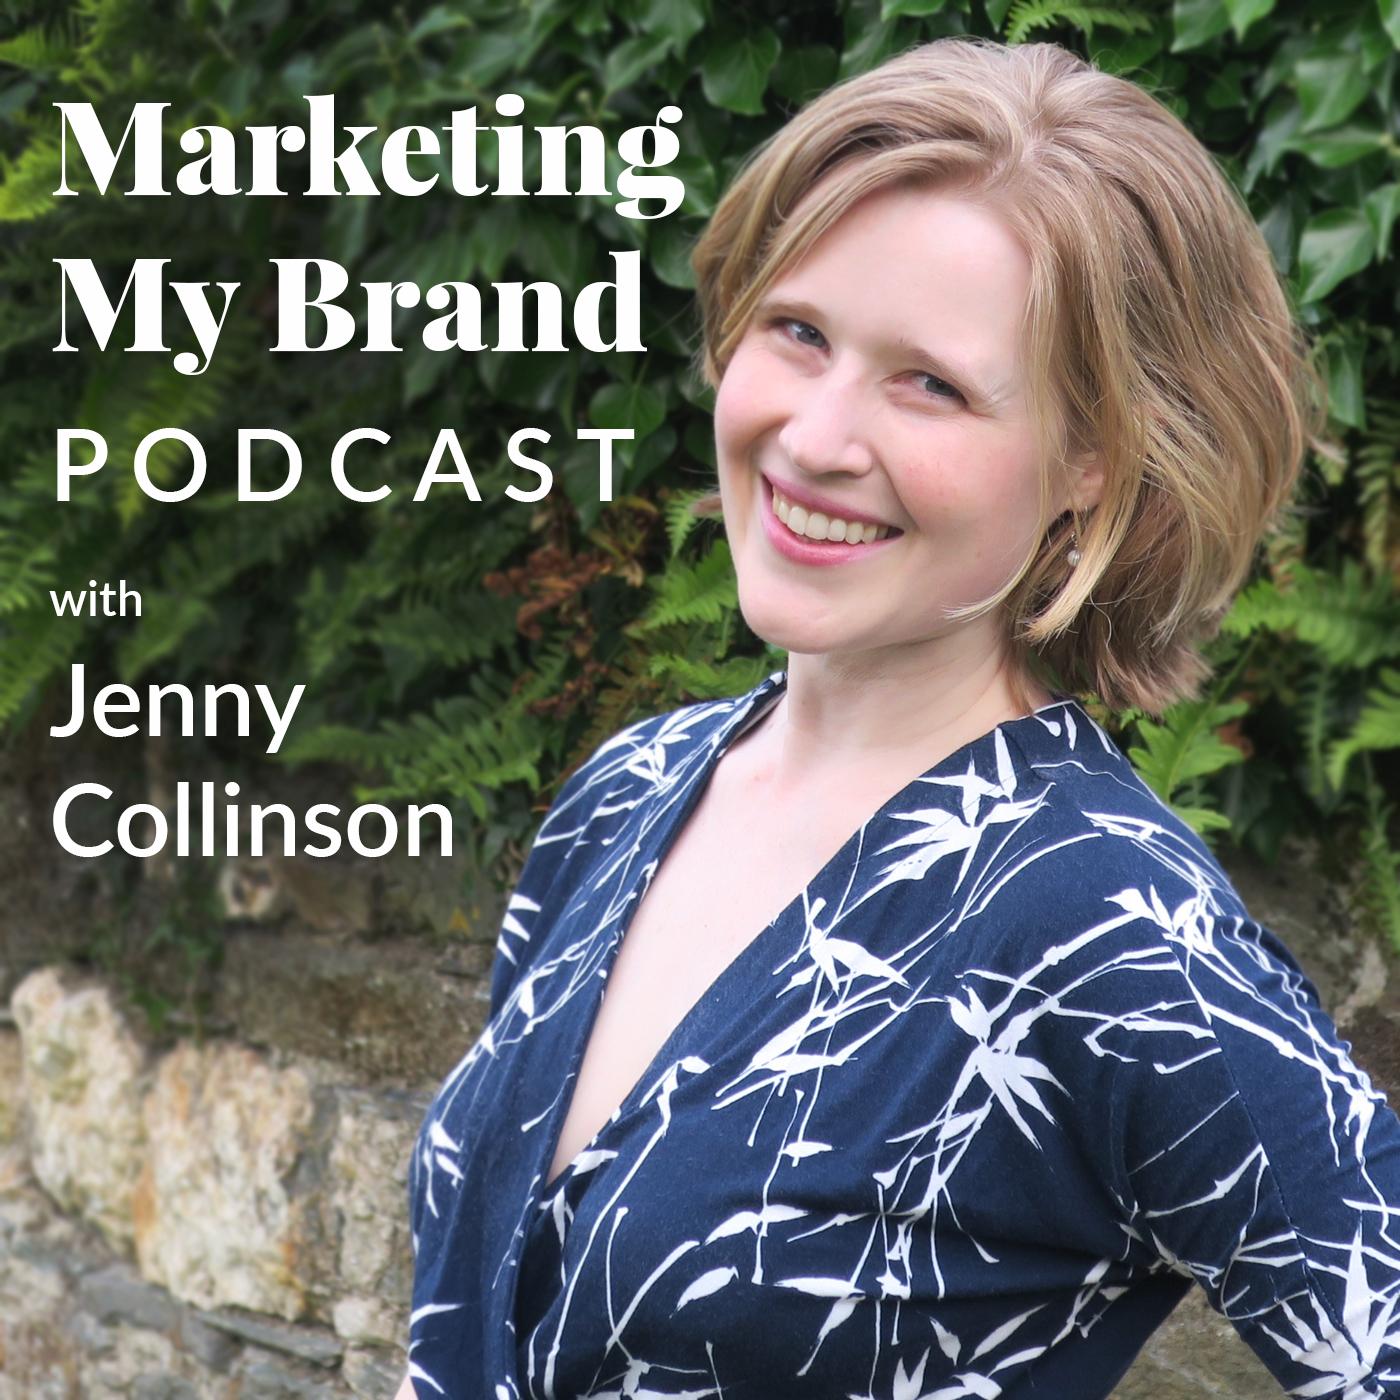 Marketing My Brand Podcast with Jenny Collinson show art